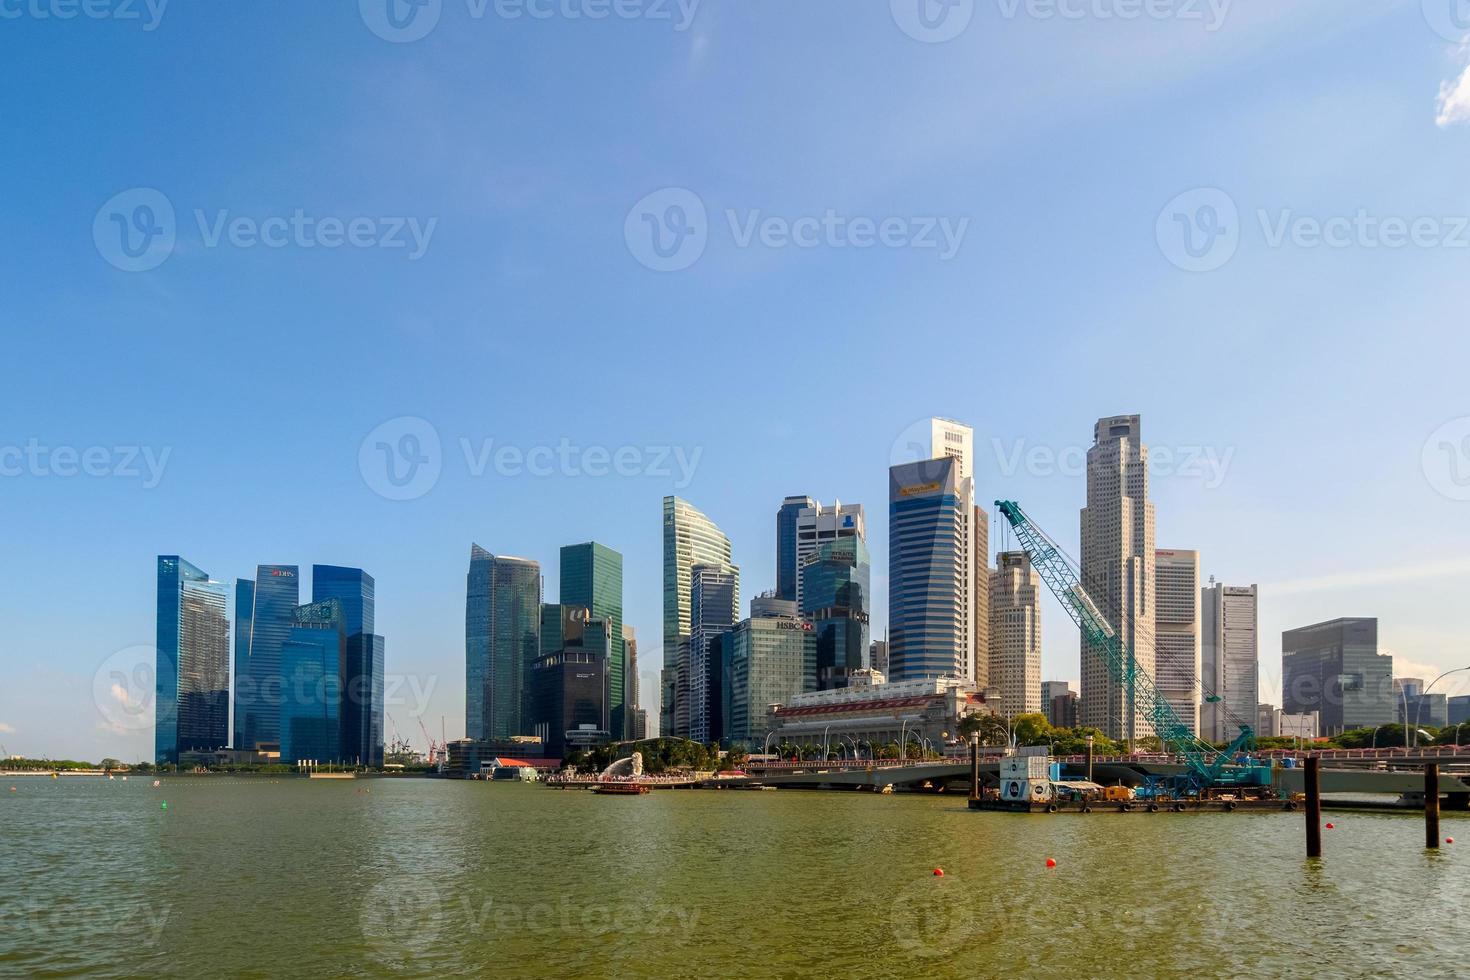 singapore - 20 juni 2014: byggnader i singapore horisont foto